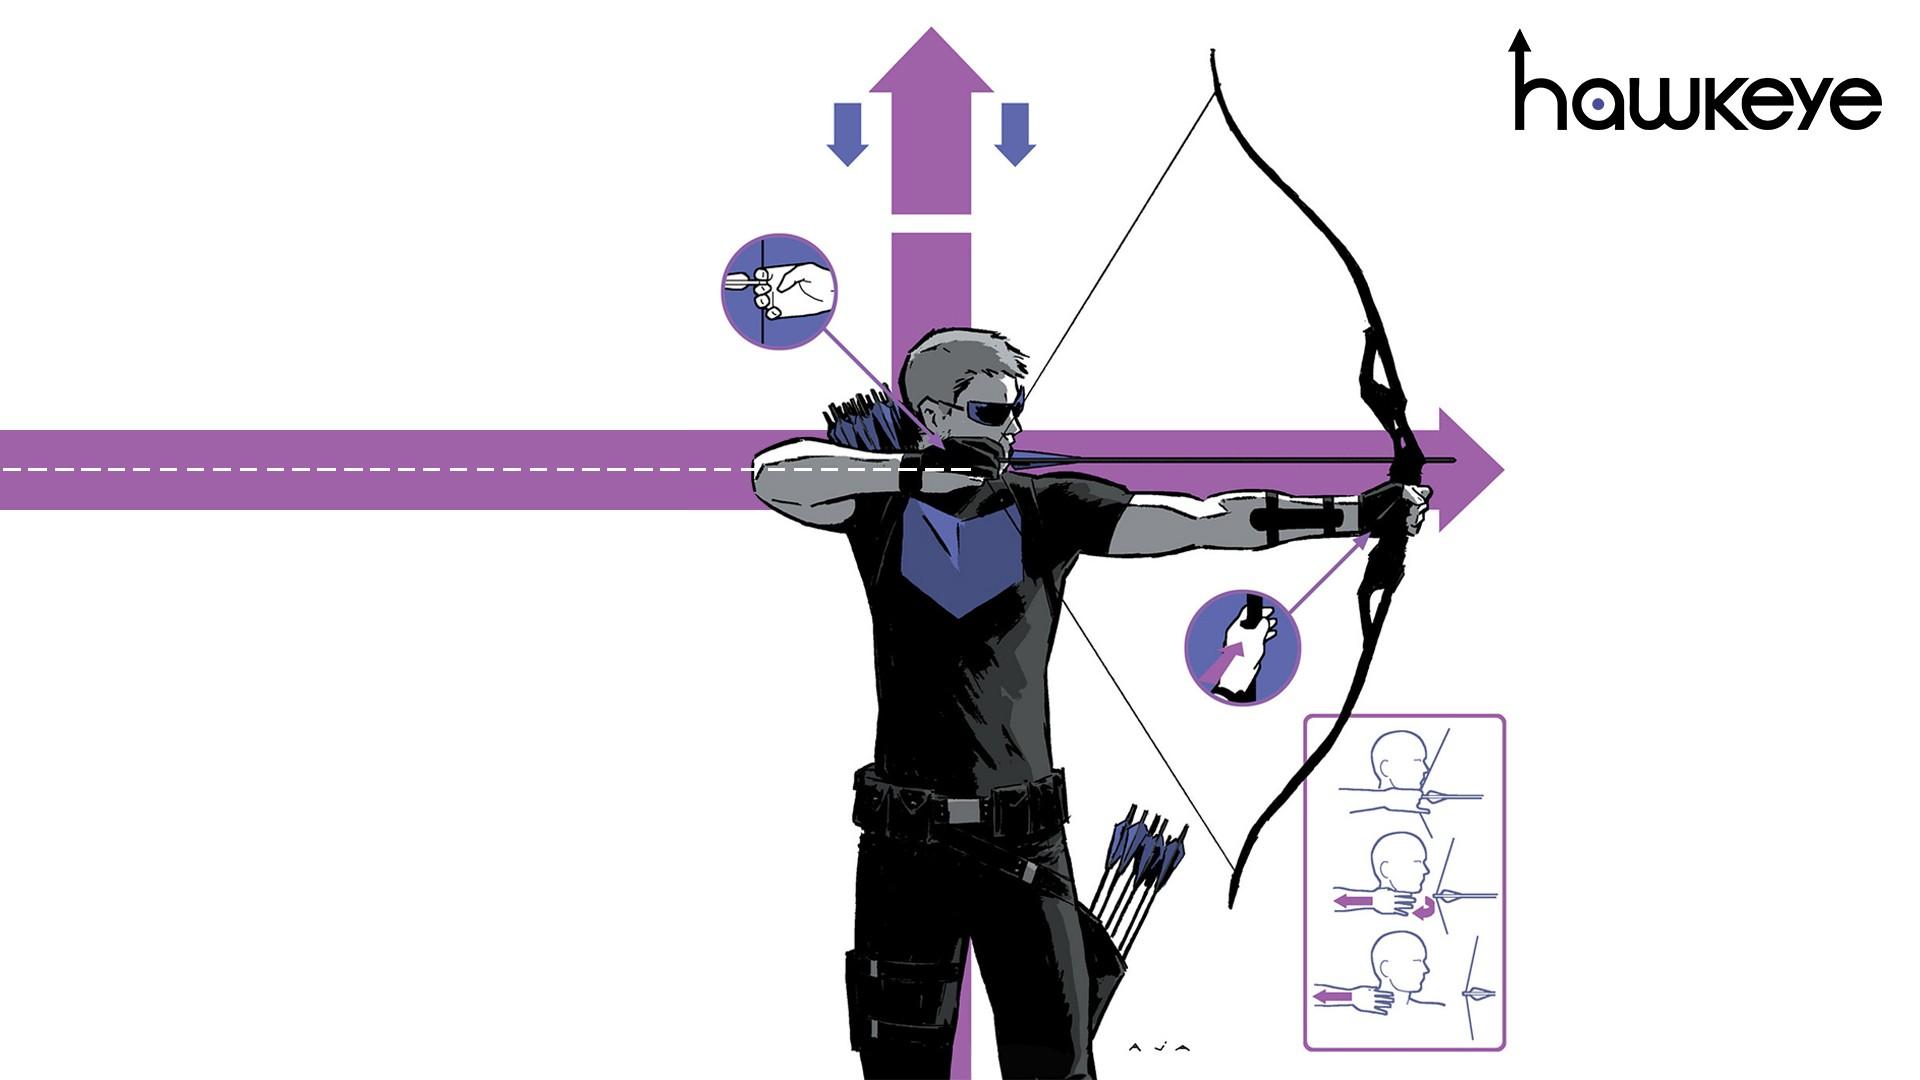 hawkeye david aja stimulated boredom Comic Book Review: Hawkeye Vol 1 My Life as a Weapon